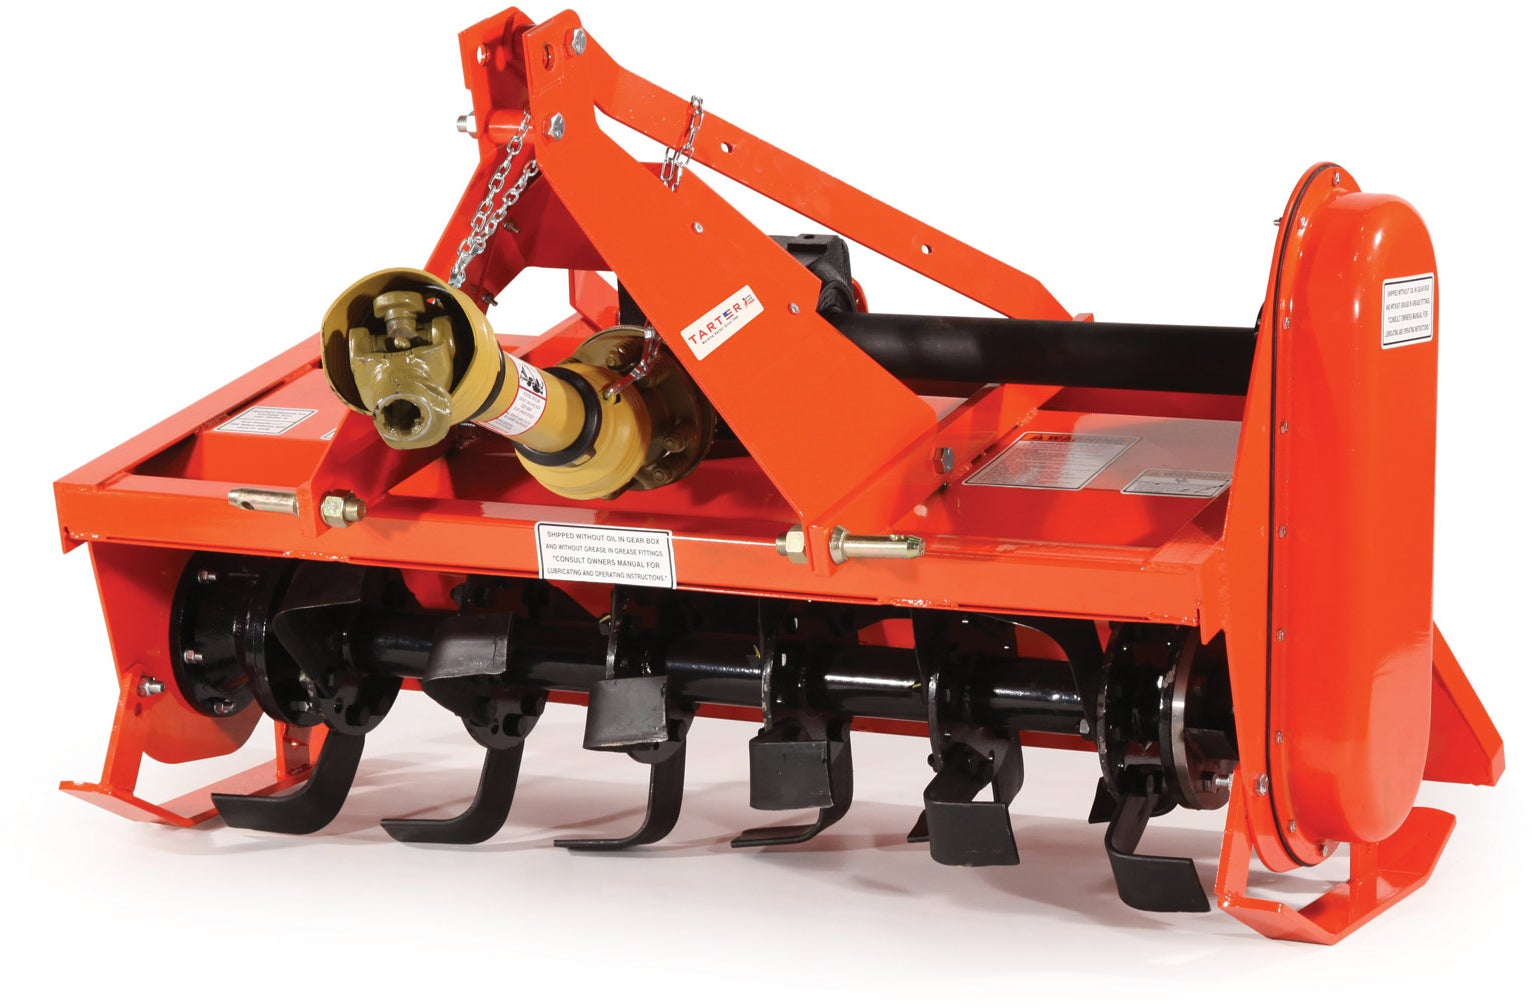 Tarter Tiller Parts Model 017380 : Tarter rotary tiller sub compact orange rtscr ebay